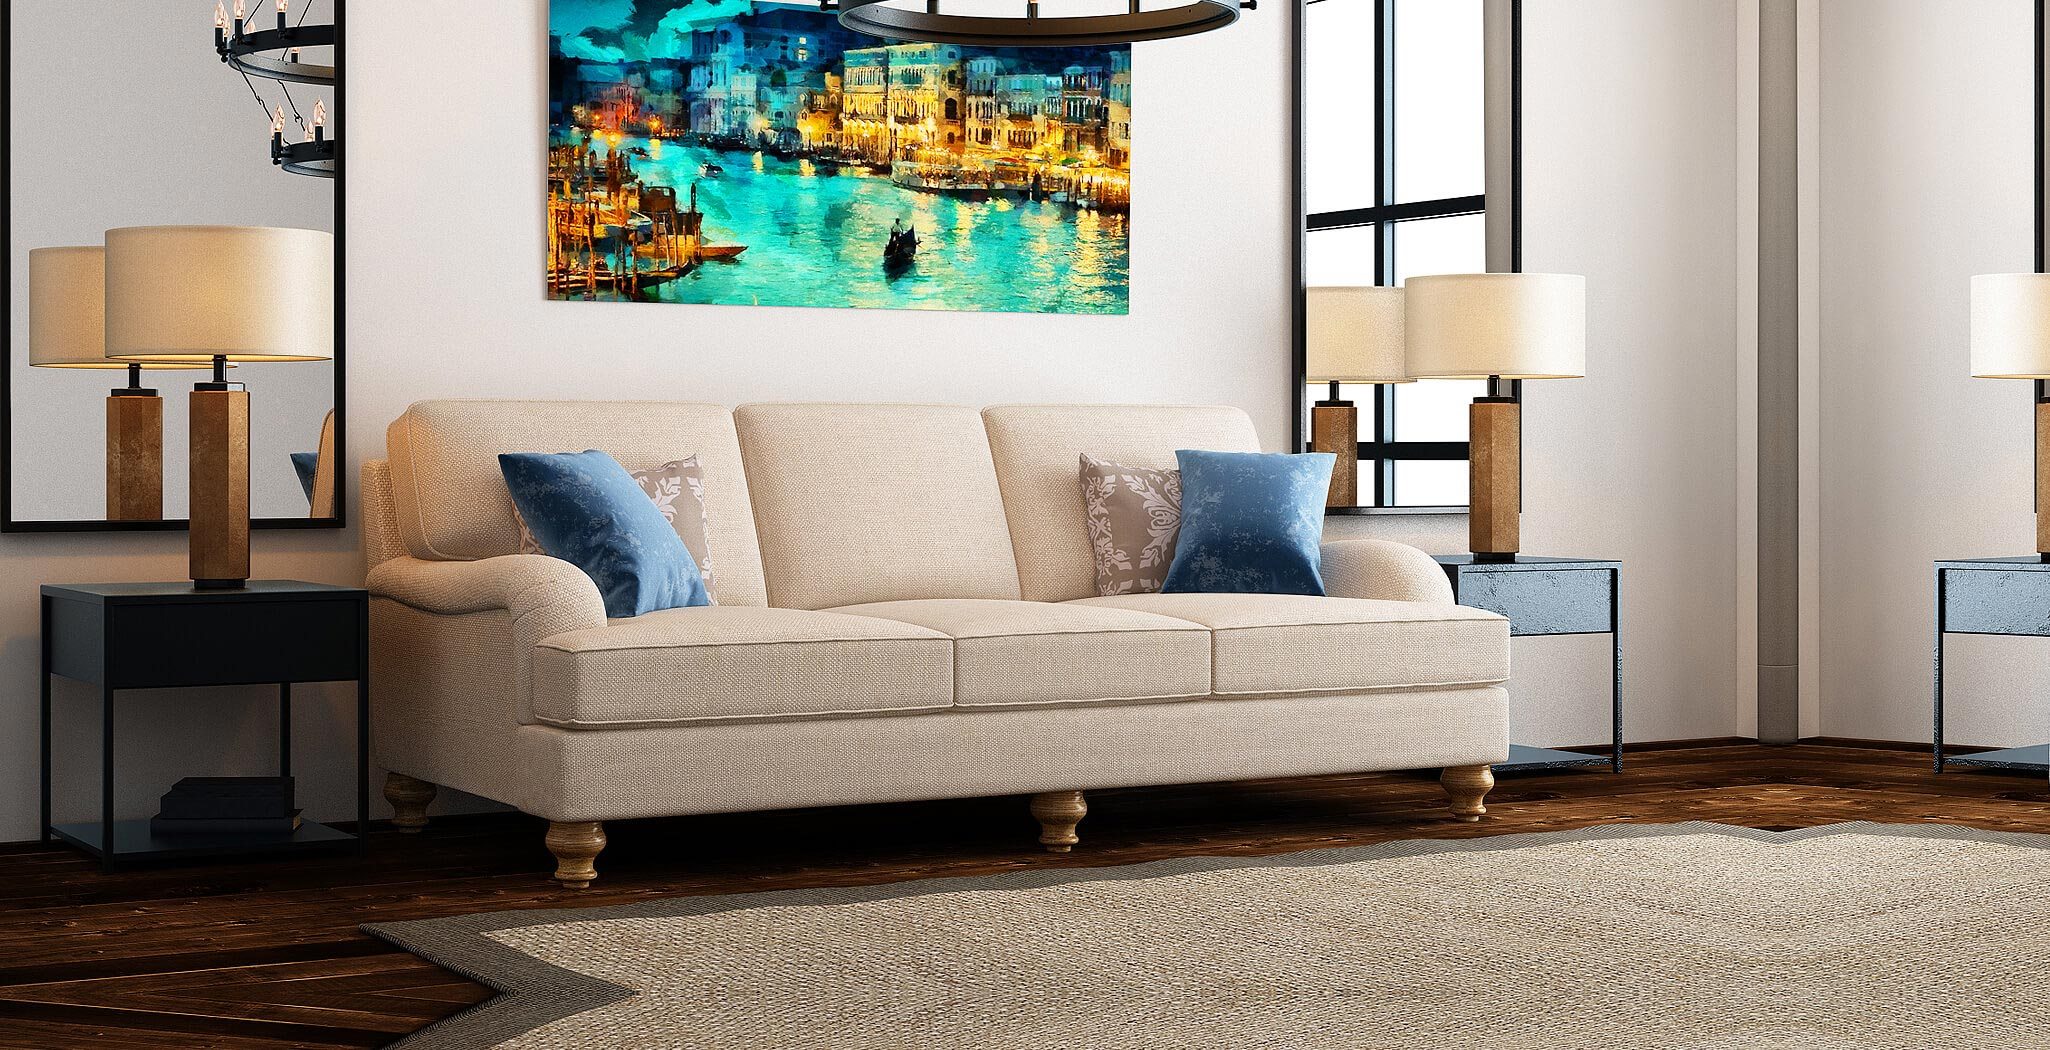 hamilton sofa furniture gallery 1